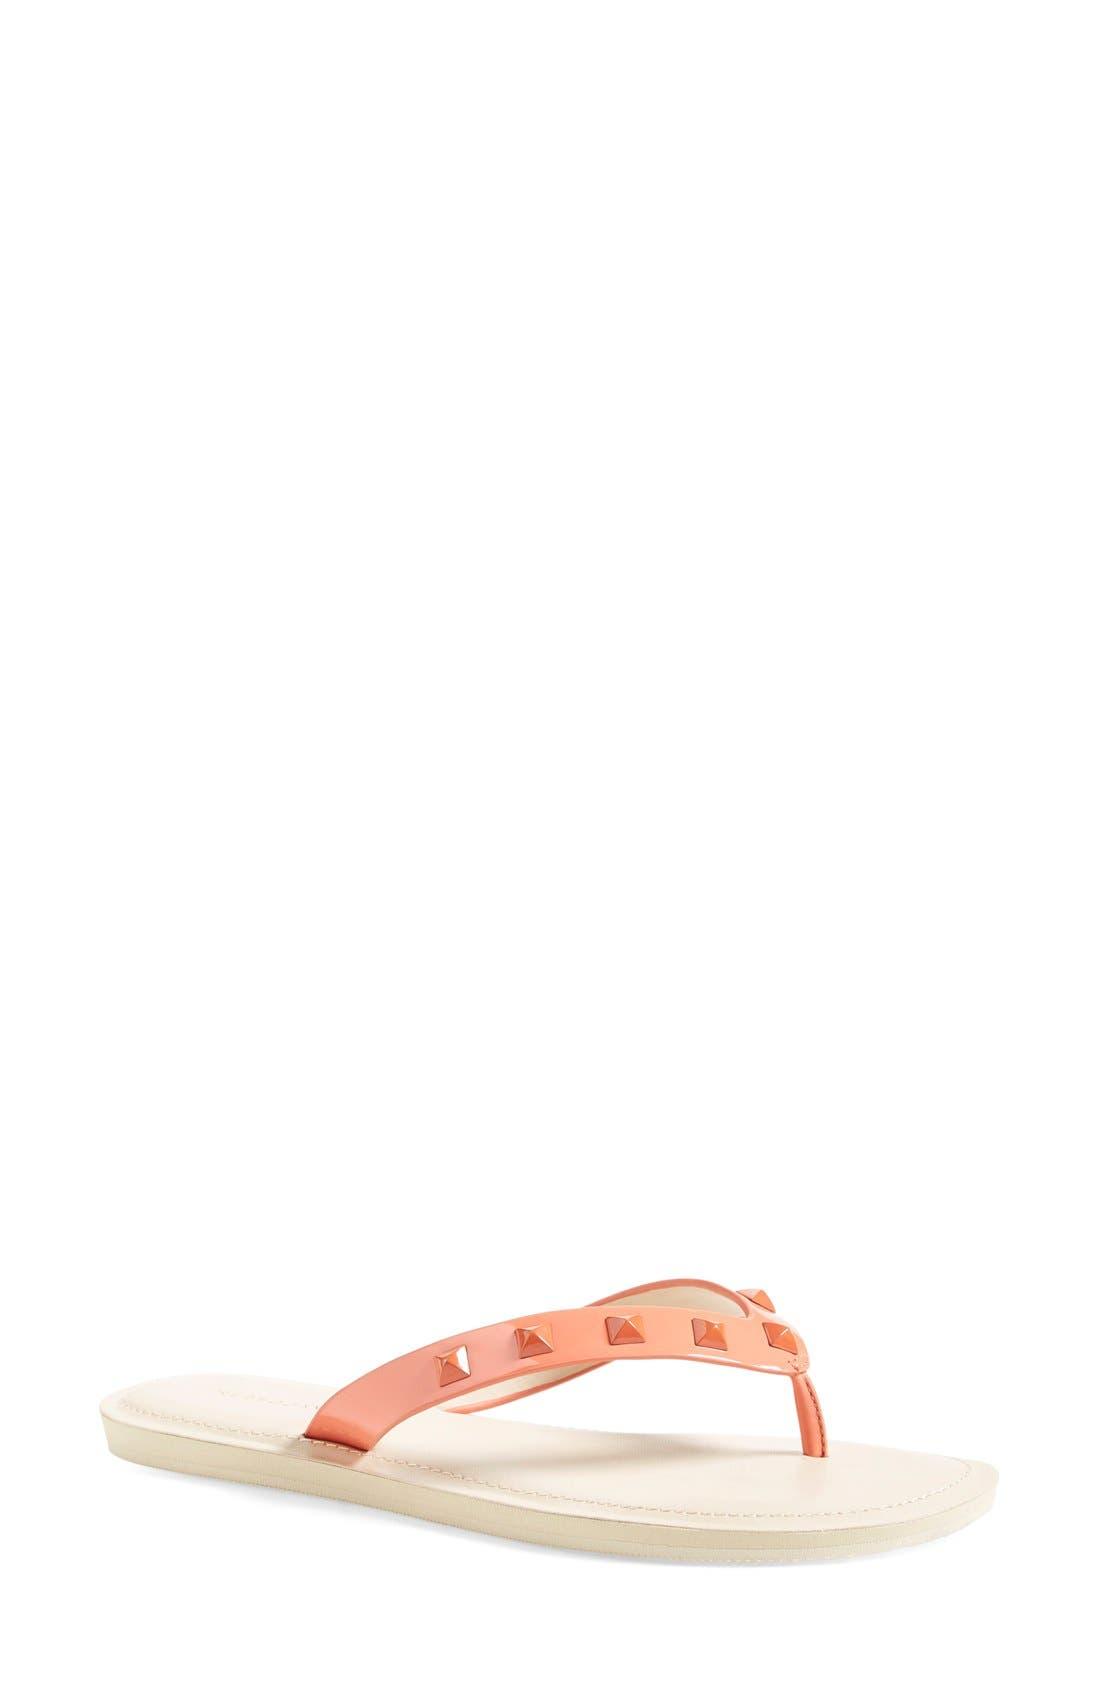 Alternate Image 1 Selected - Rebecca Minkoff 'Fiona' Thong Sandal (Women)